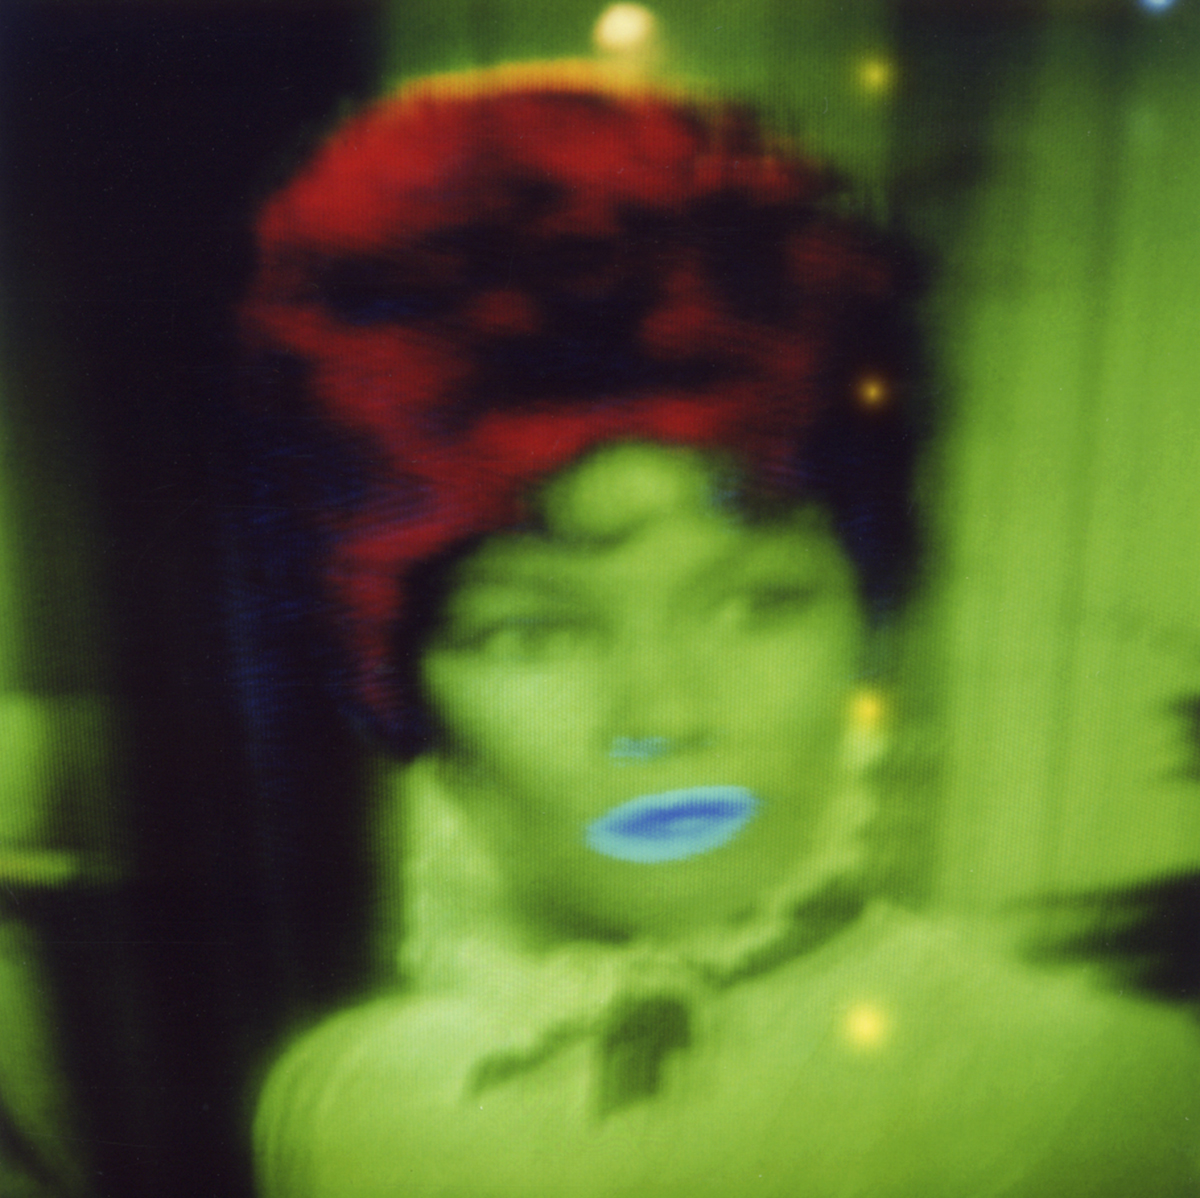 Television-TV-Polaroid-SX70-Surreal-Woman.jpg